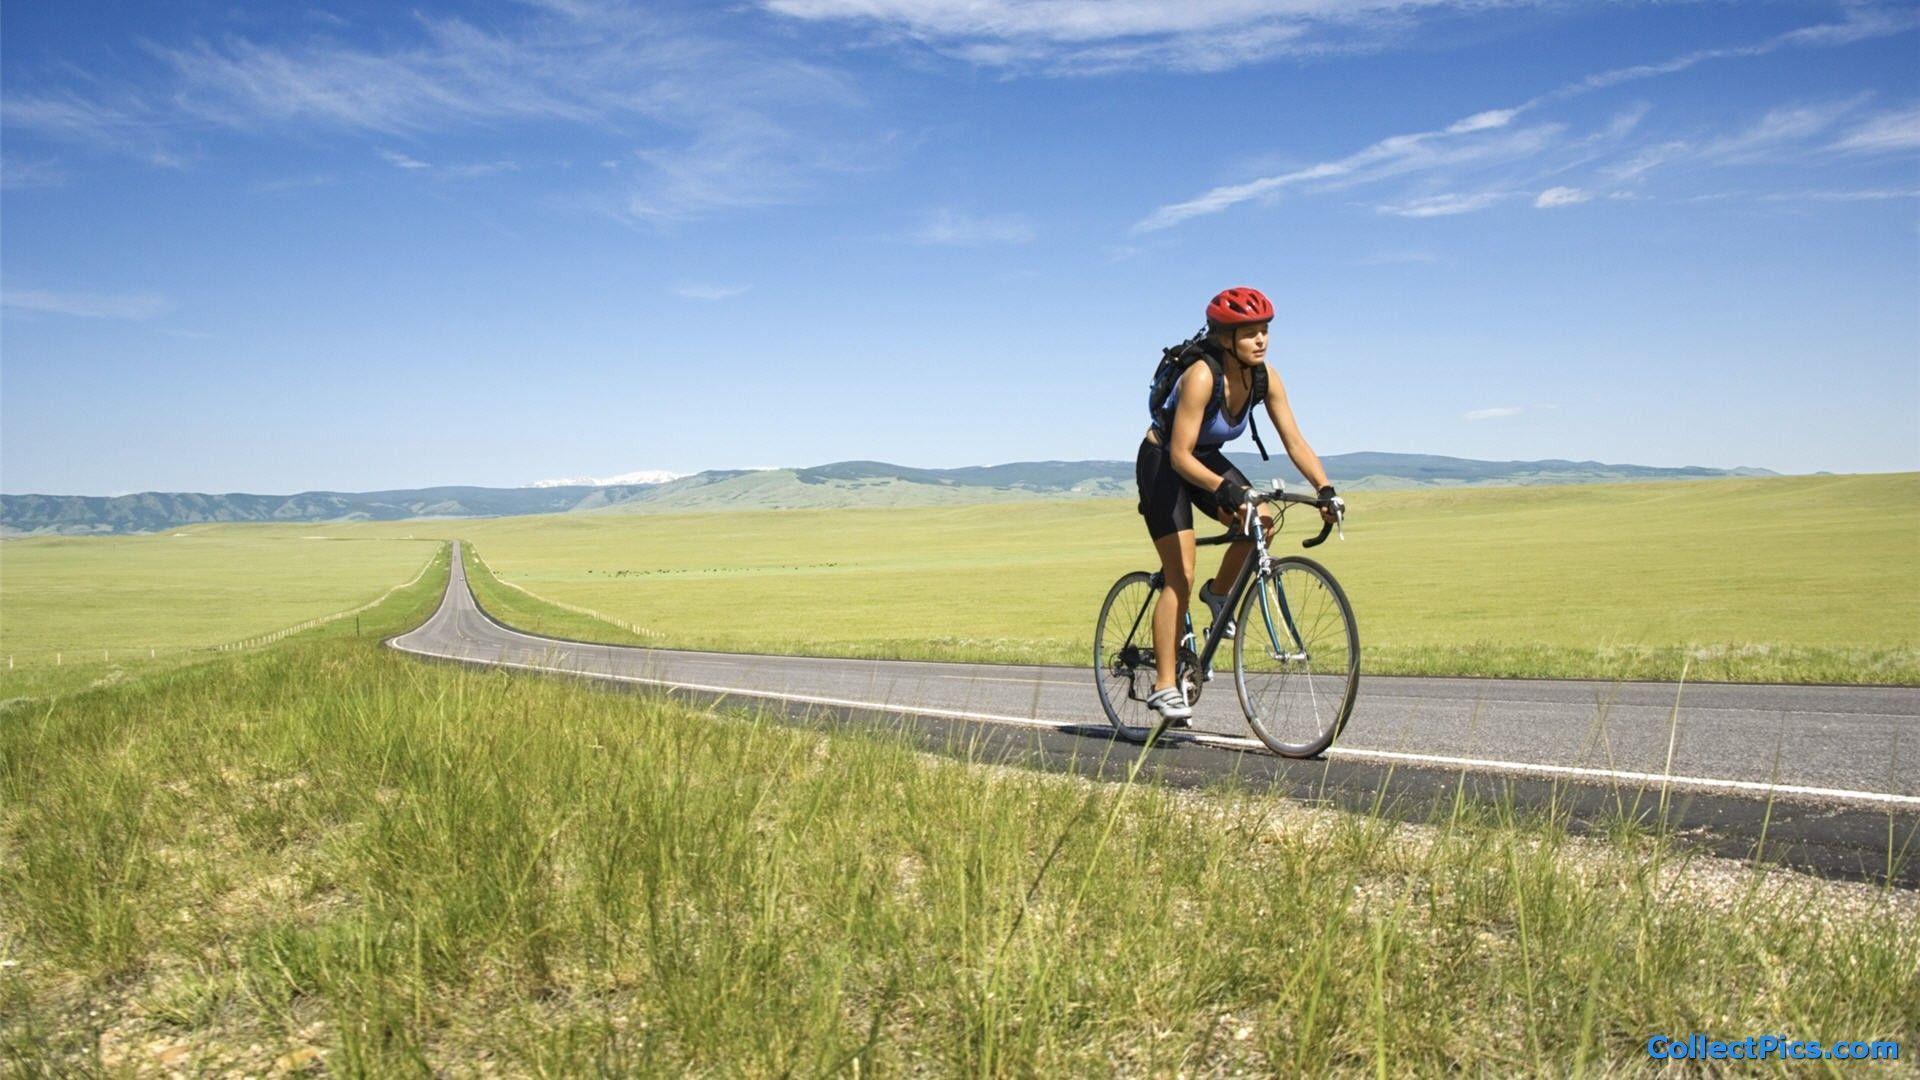 Hd Electric Bike Images Bike Hd Wallpapers 1920x1080: Road Biking Wallpapers